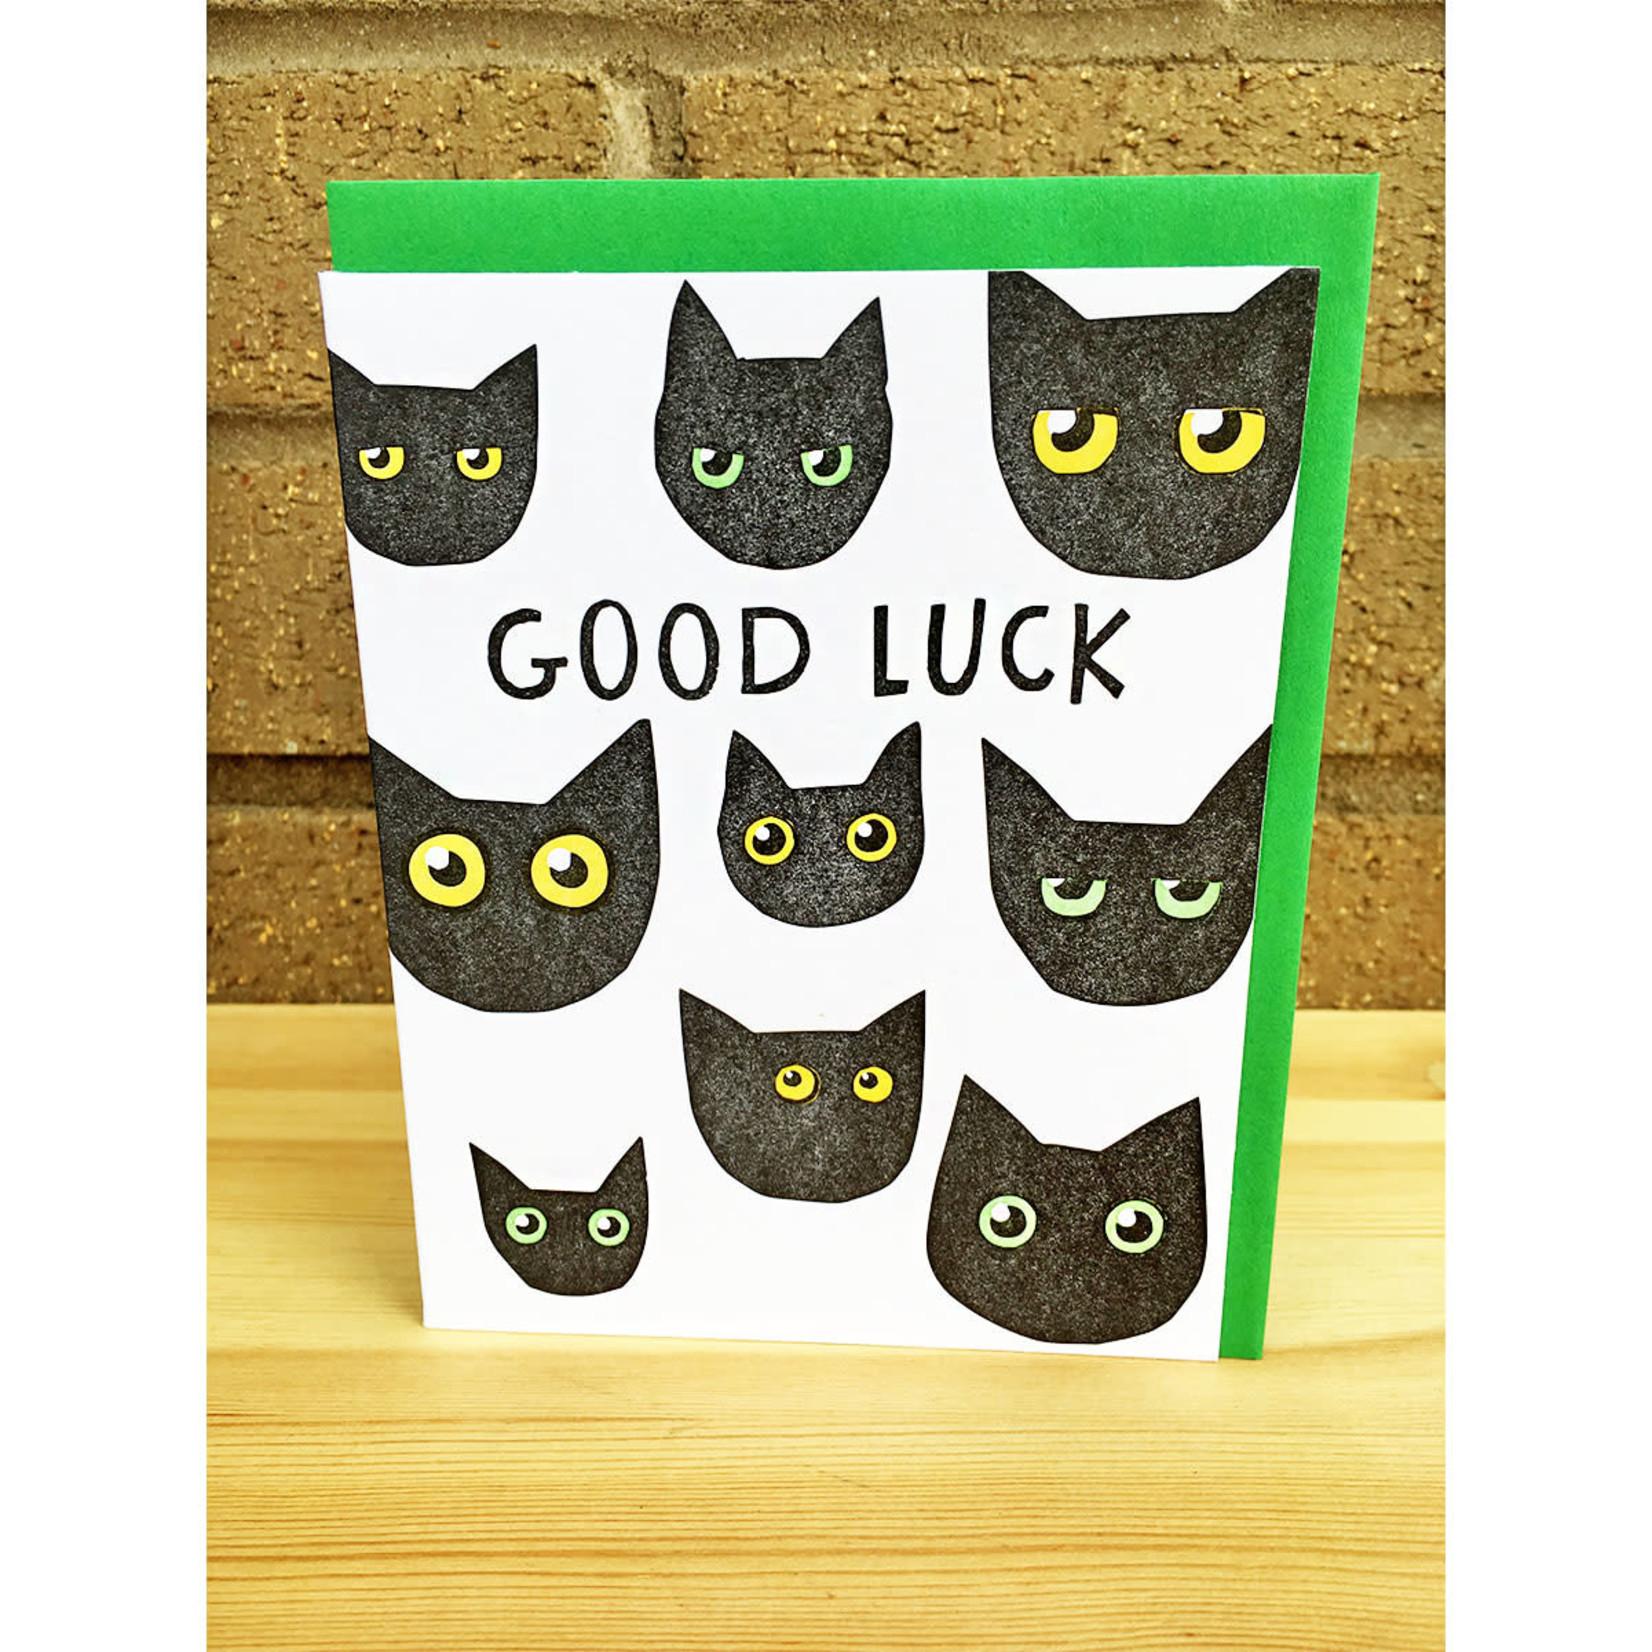 Big Wheel Press Good Luck Black Cats Greeting Card